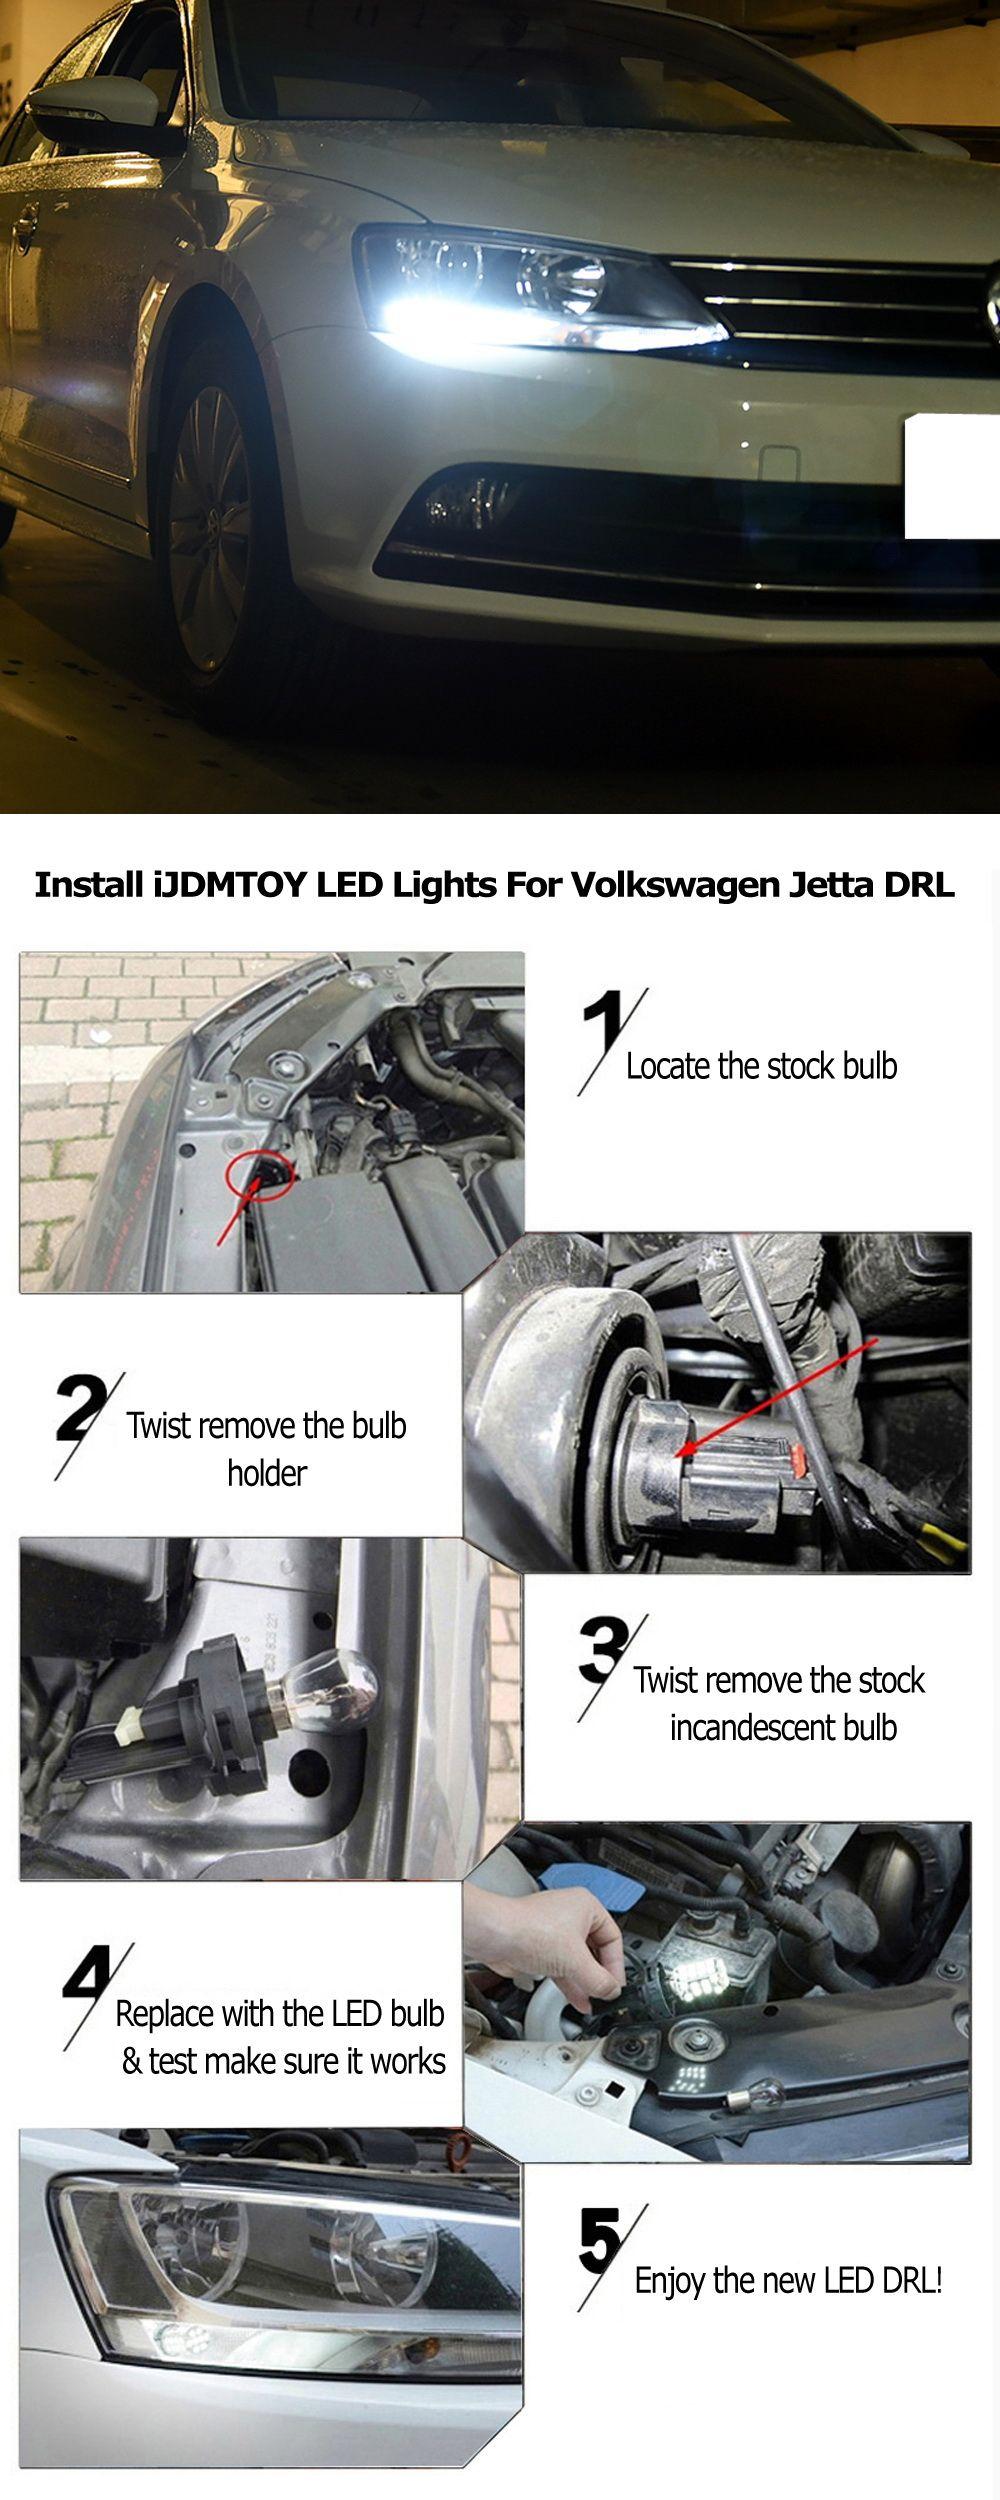 Pin On Volkswagen Led Lights